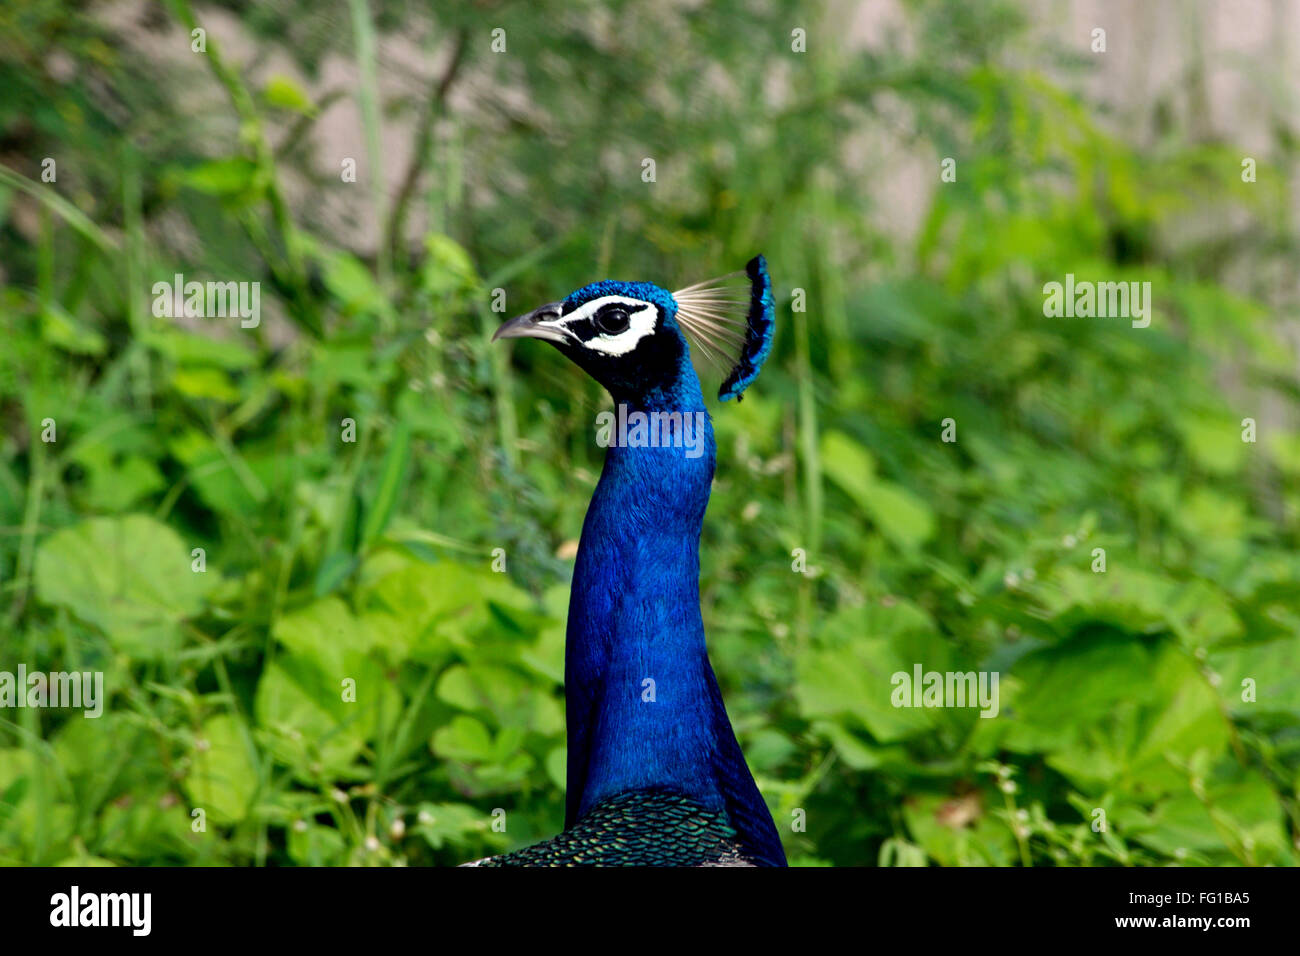 Peafowl Peacock Surat Gujarat India Asia Sept 2010 - Stock Image